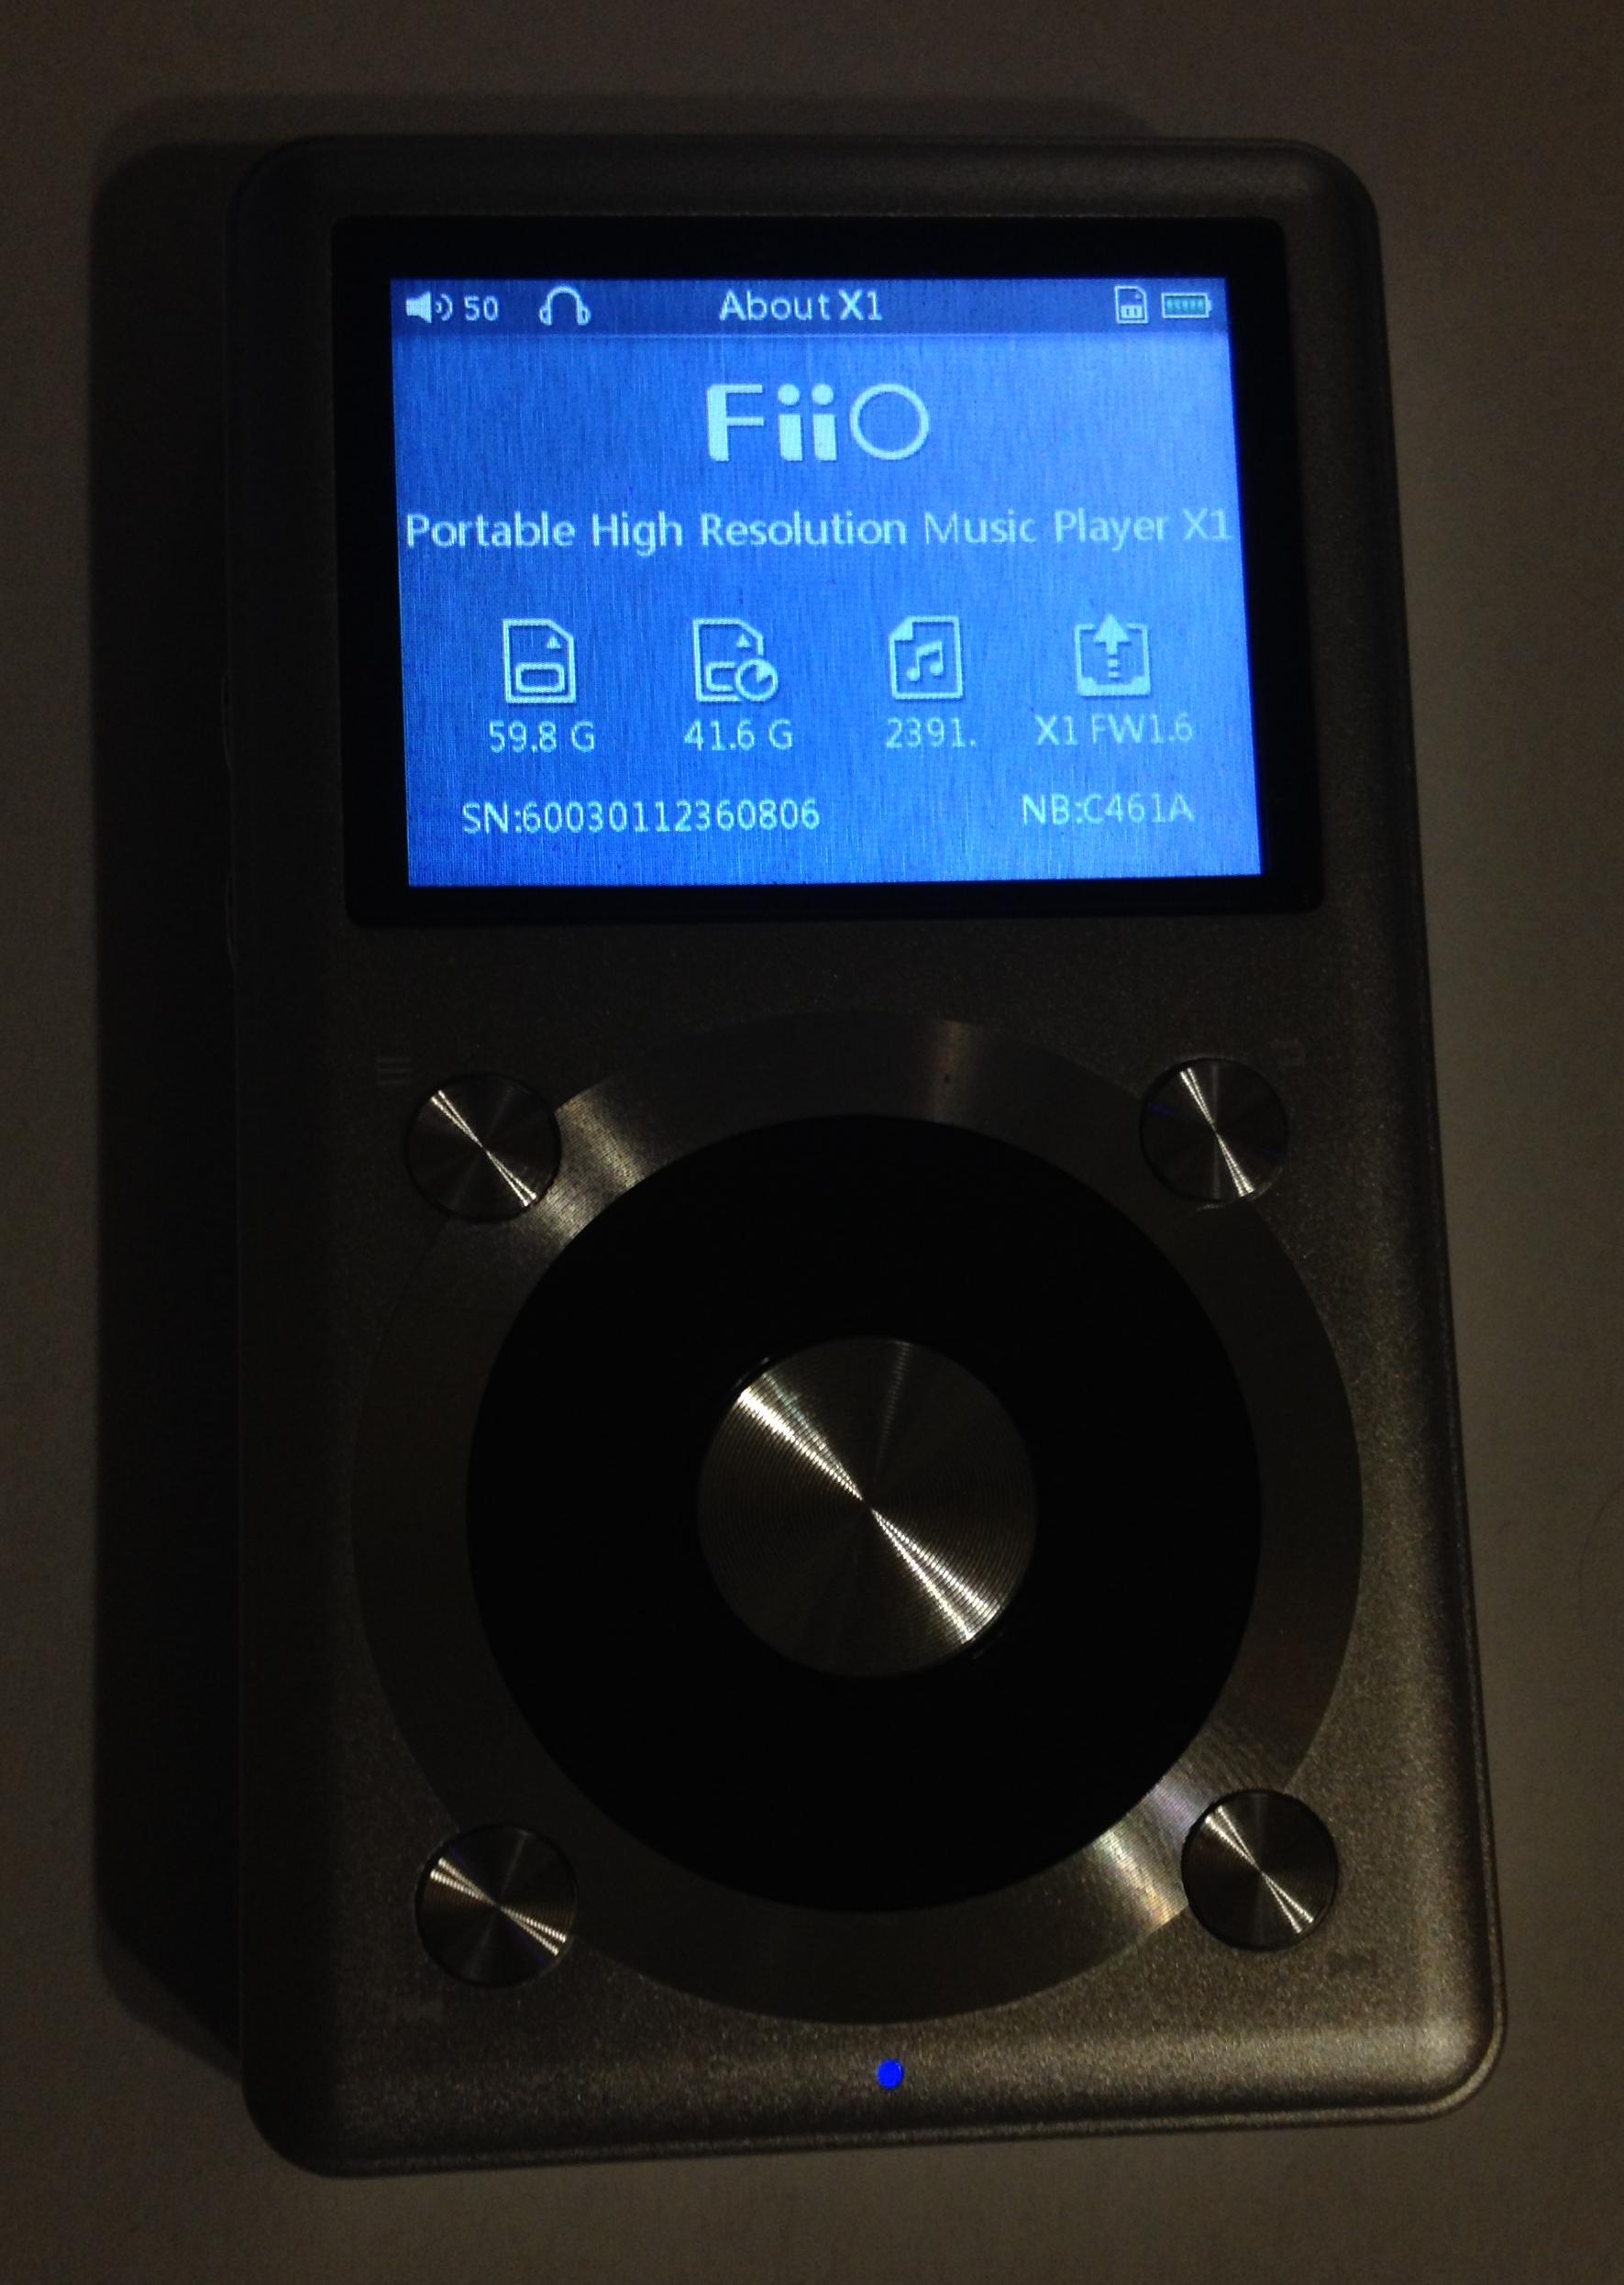 Fiio X1 firmware 1.6